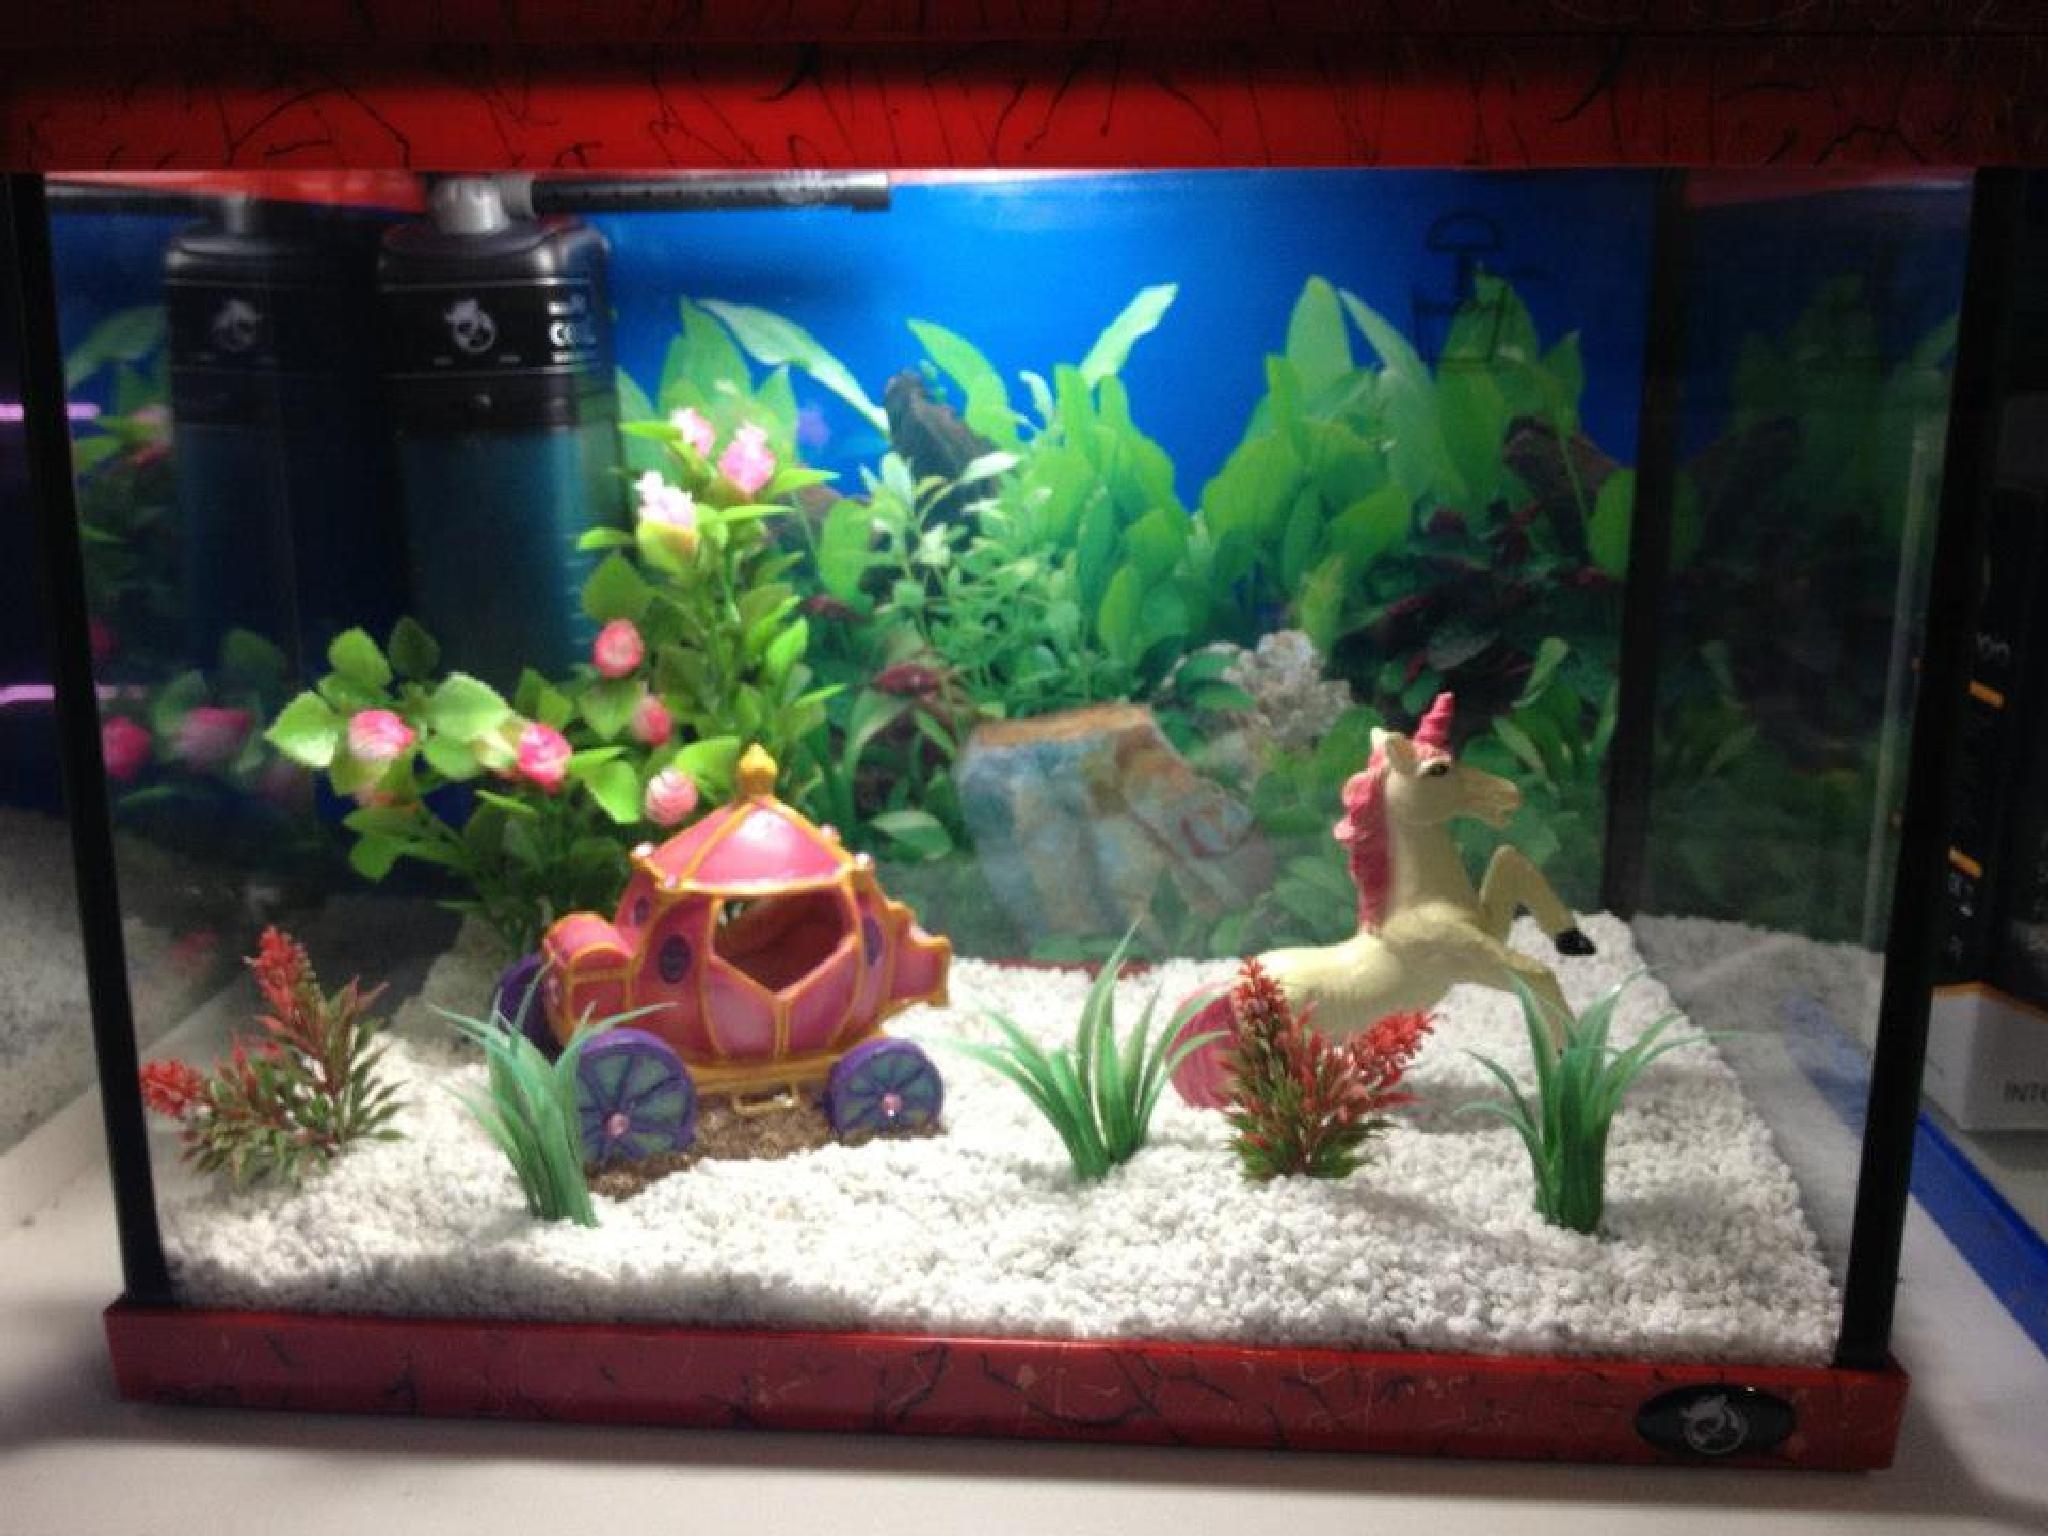 Aquarium Maintenance Service in Melbourne by Adrian Pozzedon